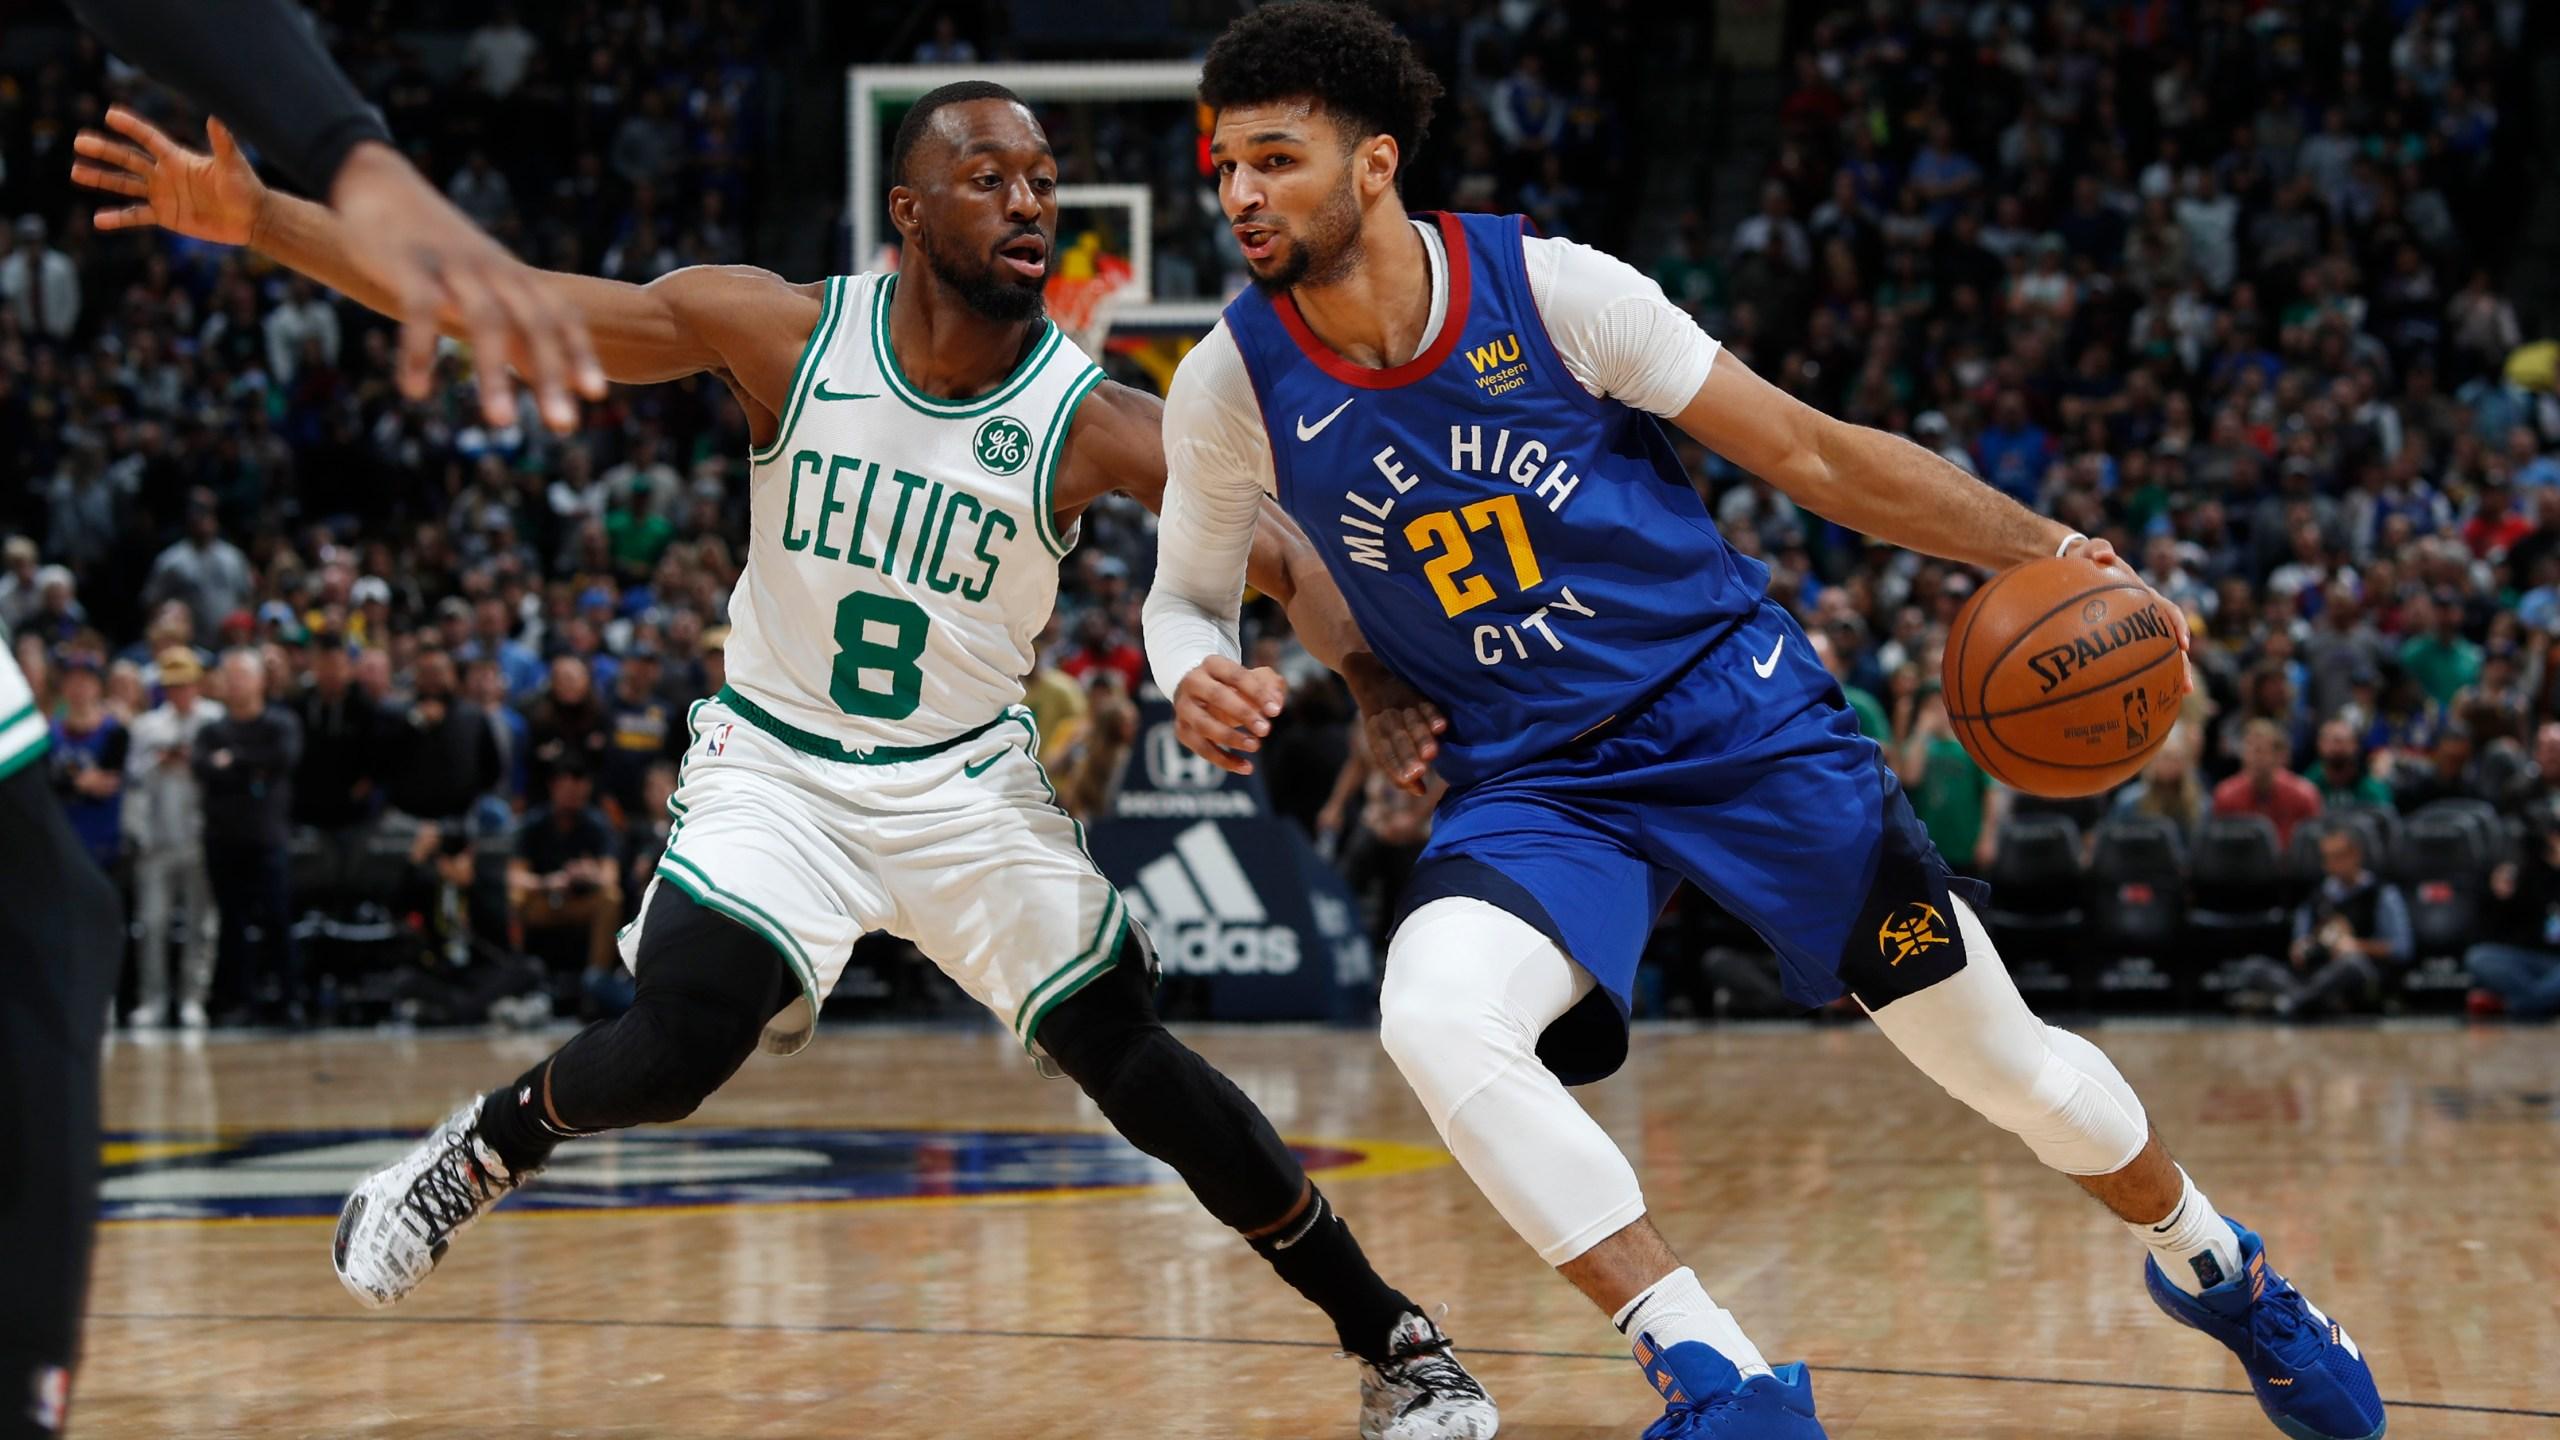 Celtics Kemba Walker Has Concussion Like Symptoms Wvns